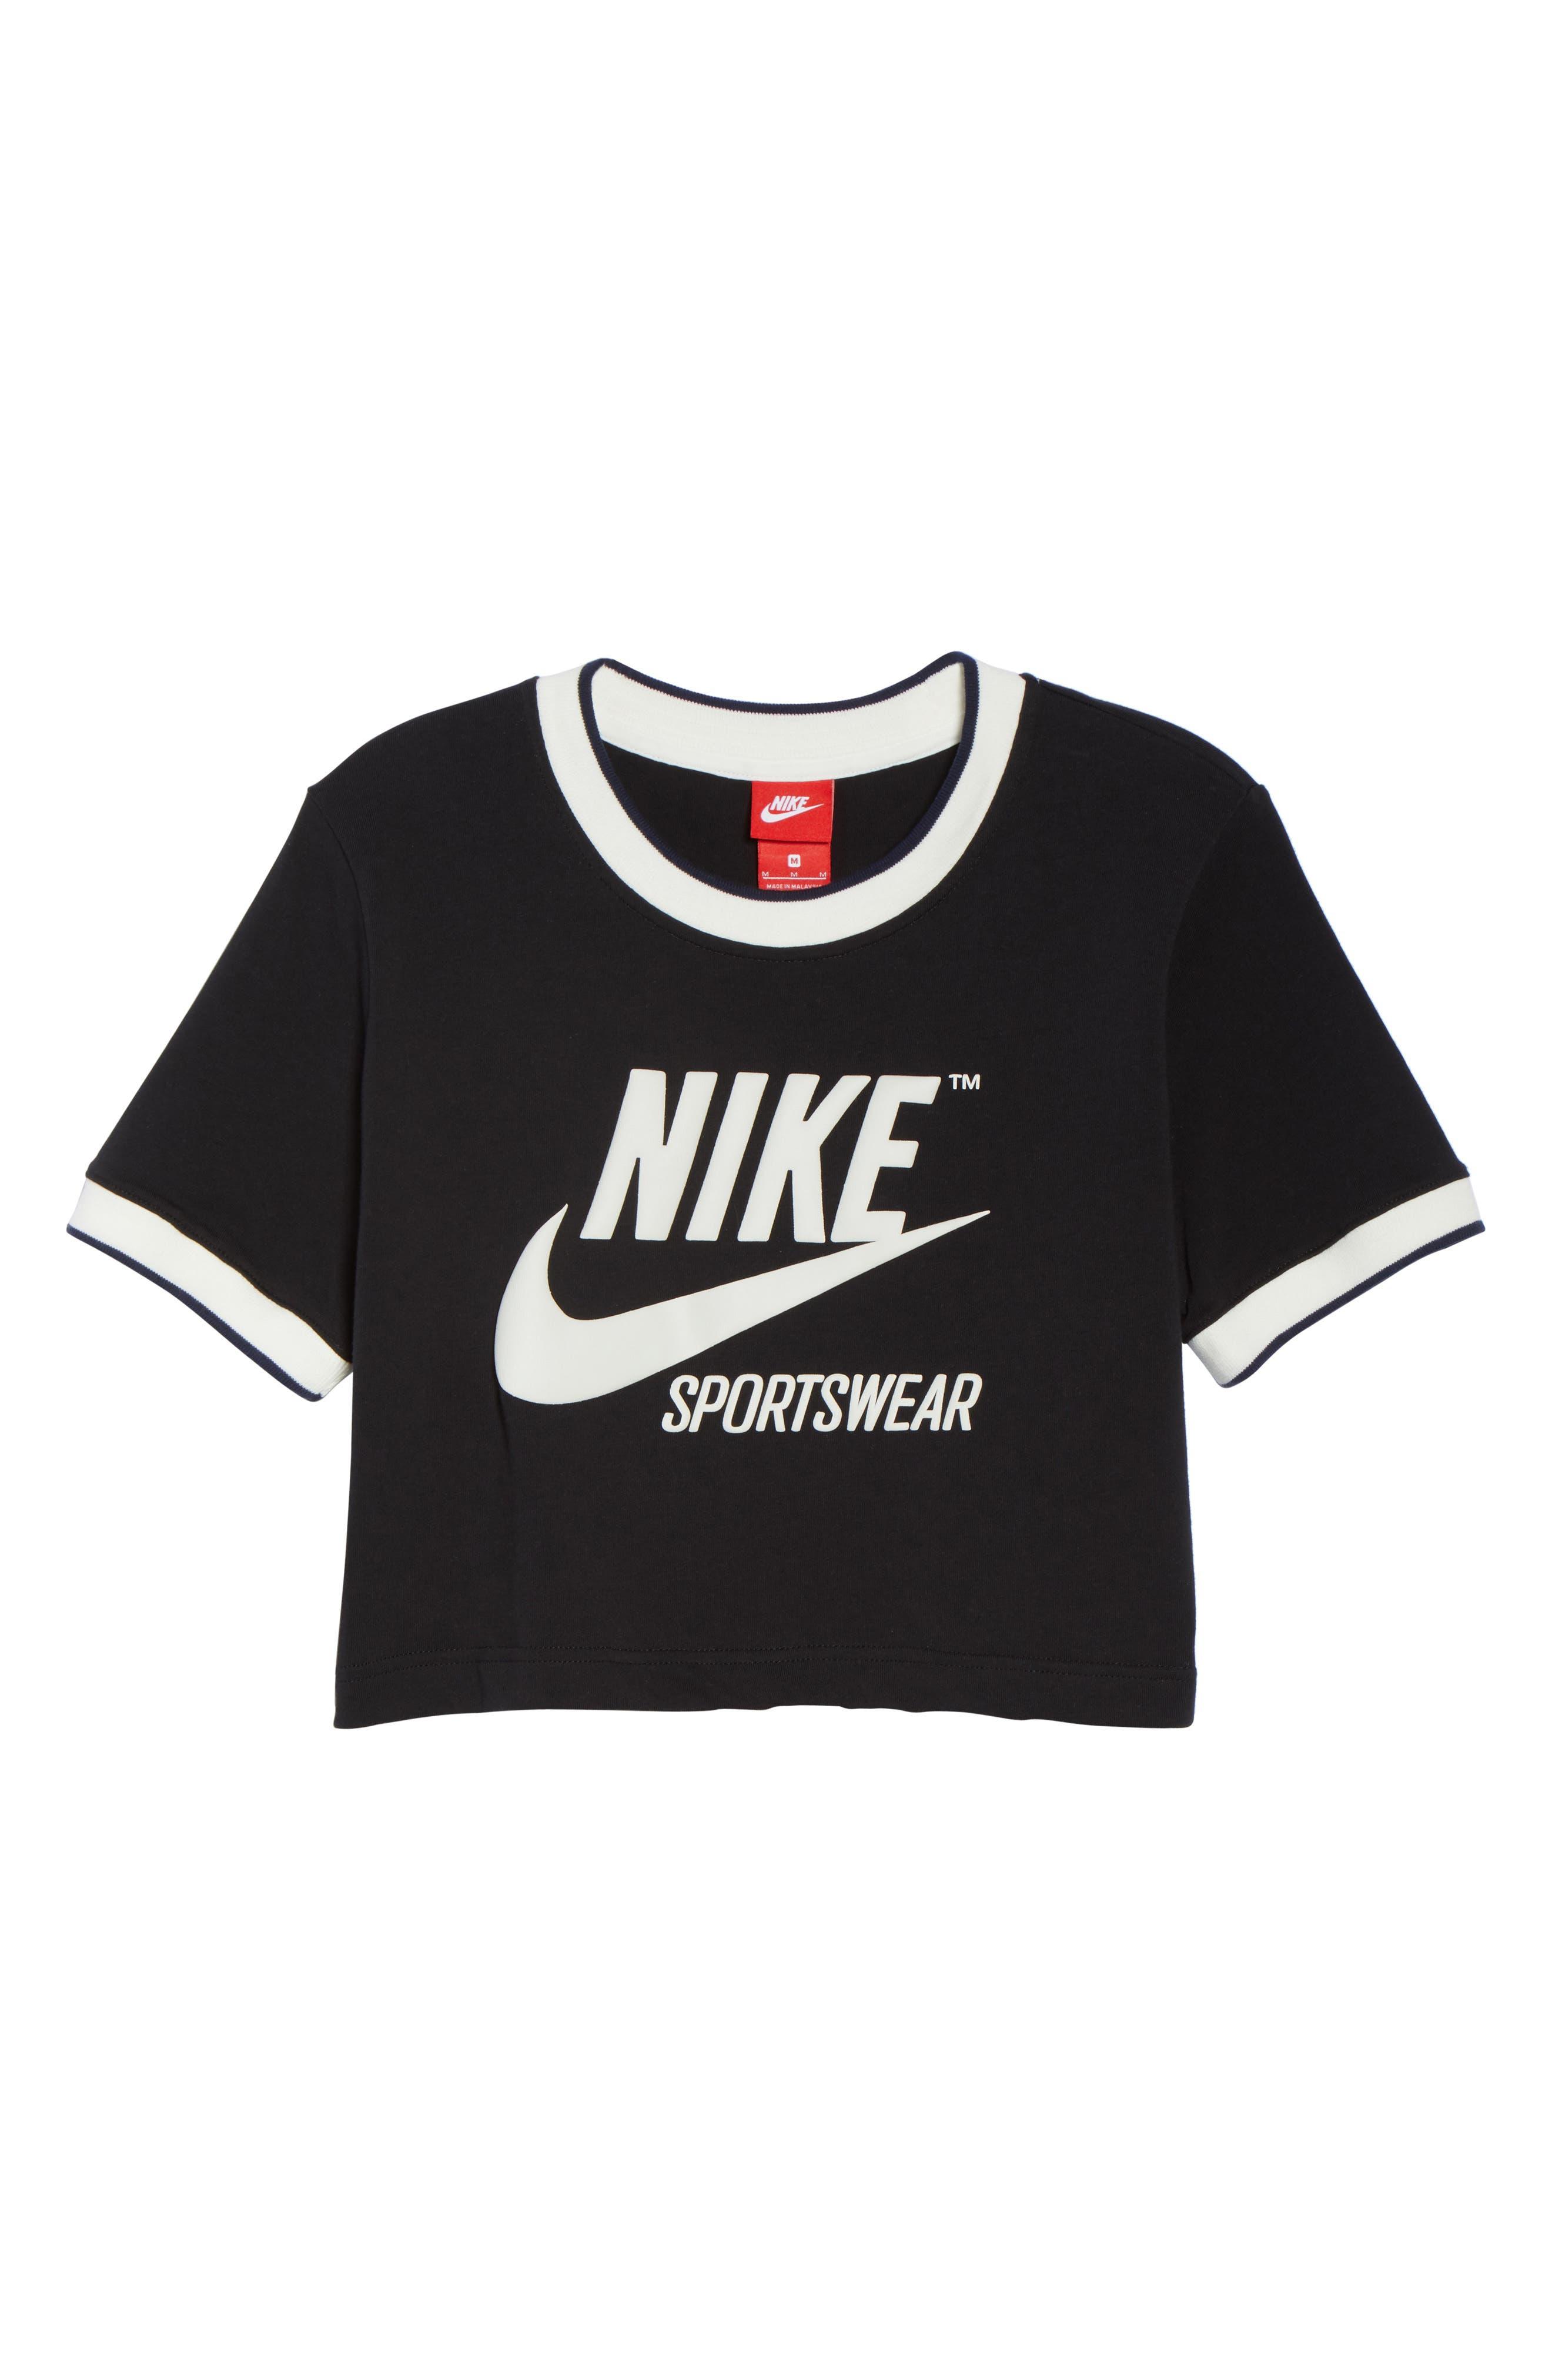 Sportswear Crop Top,                             Alternate thumbnail 7, color,                             010